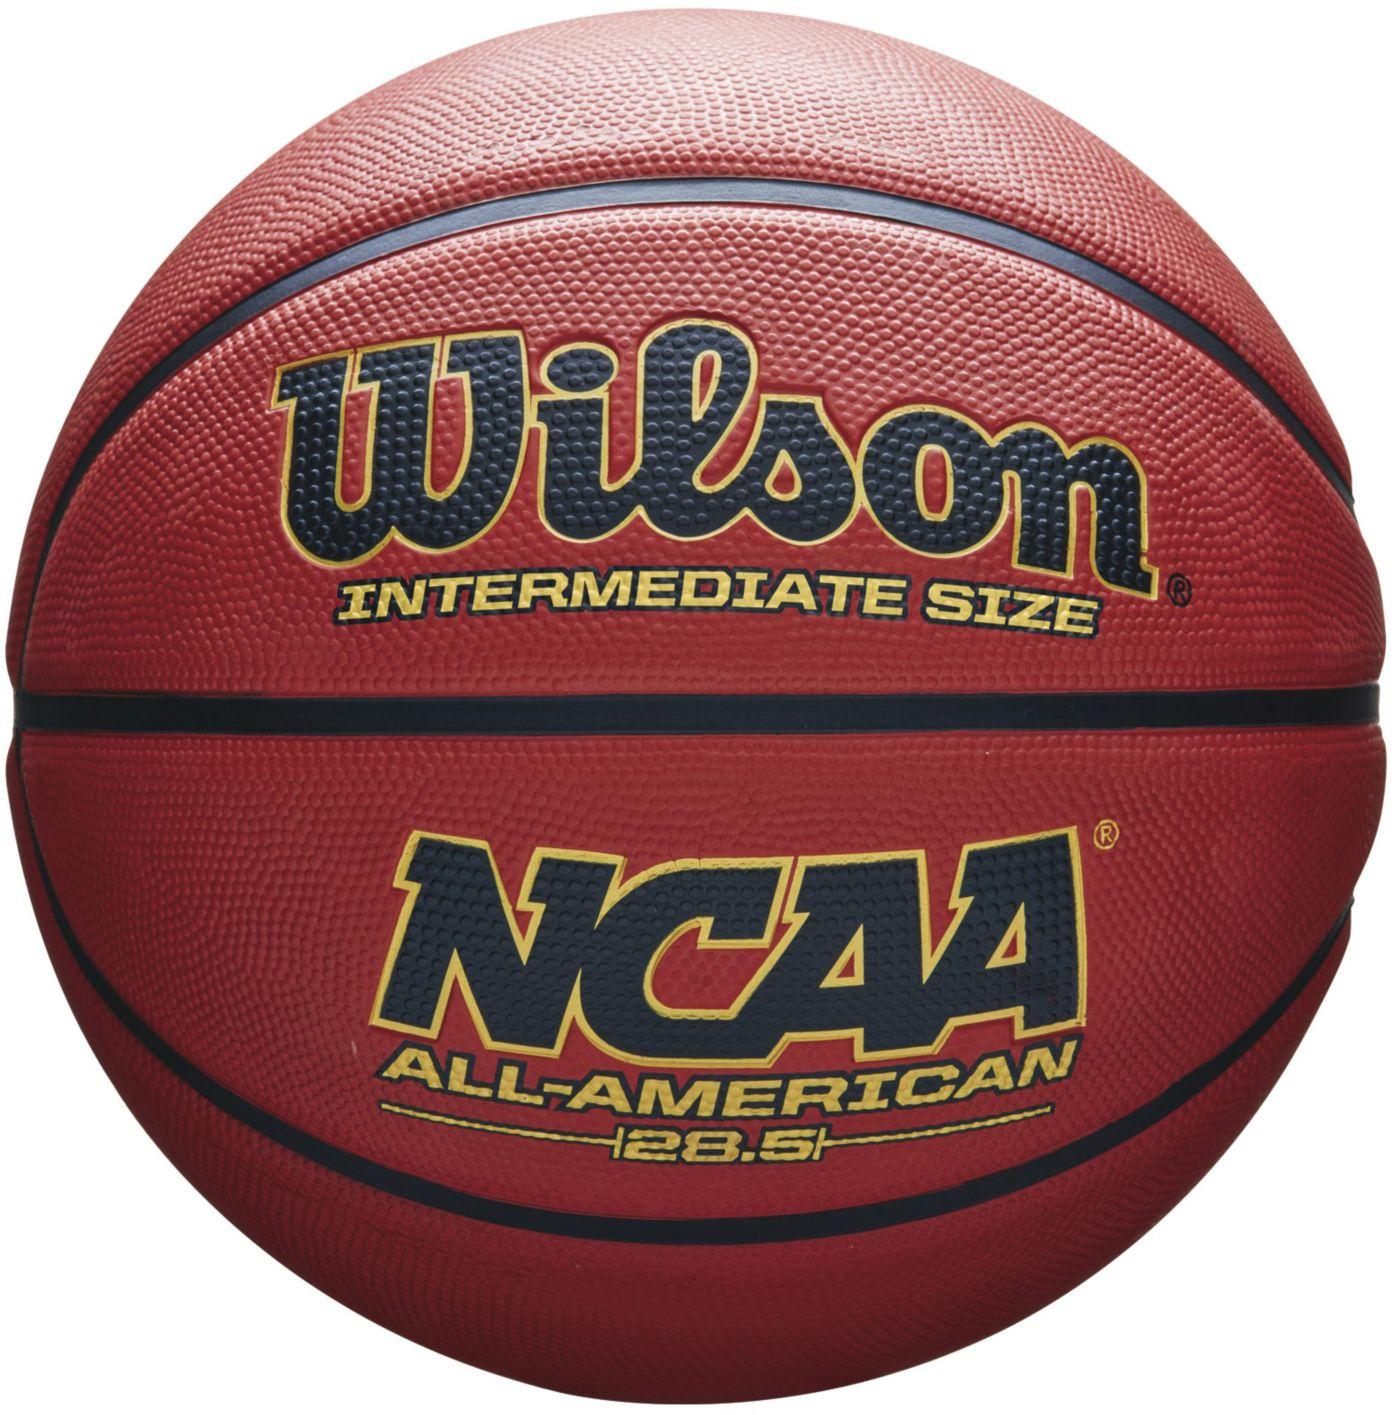 "Wilson NCAA All-American Basketball (28.5"")"